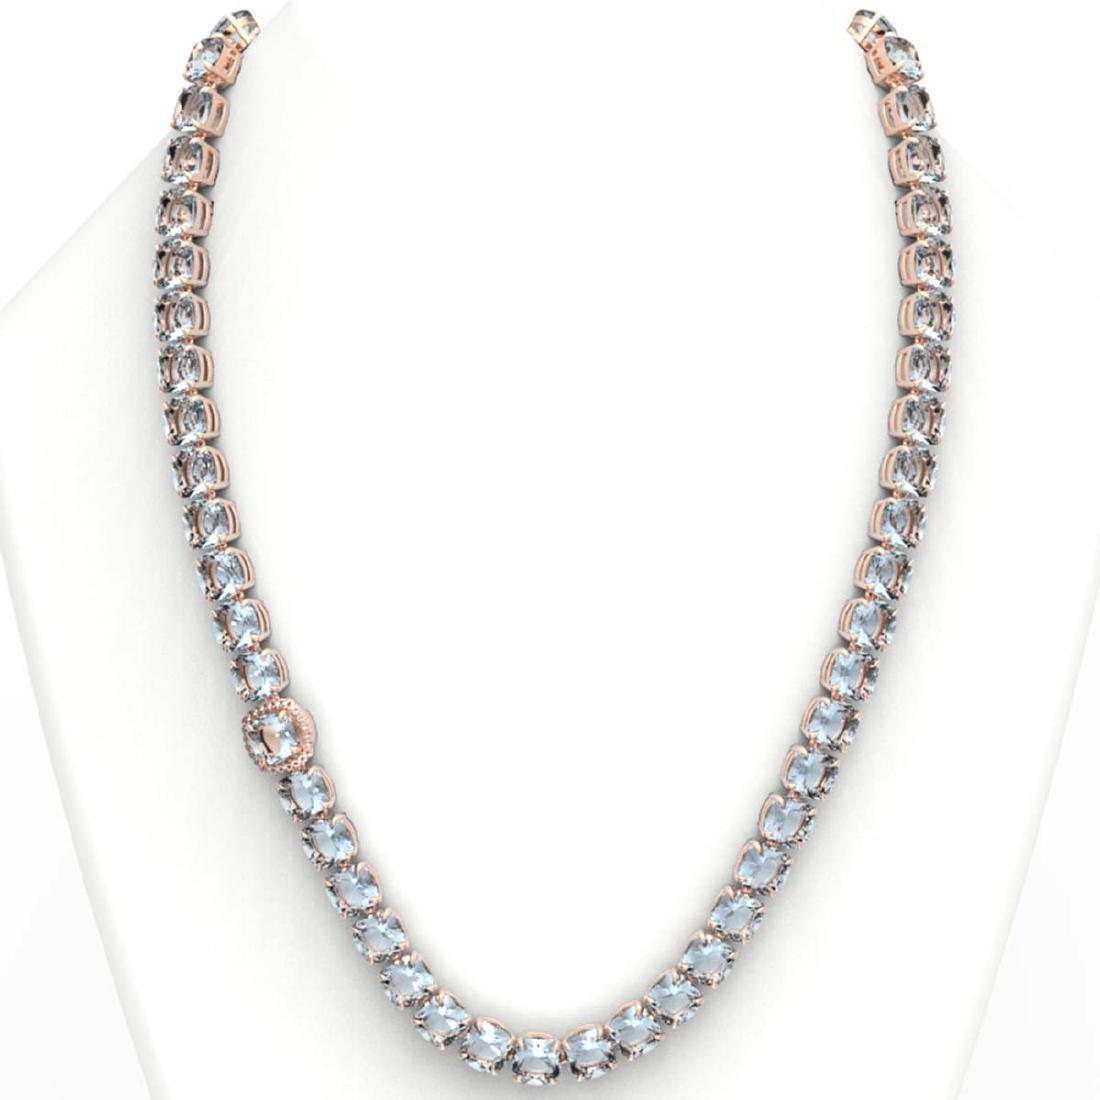 87 ctw Sky Blue Topaz & VS/SI Diamond Necklace 14K Rose - 3